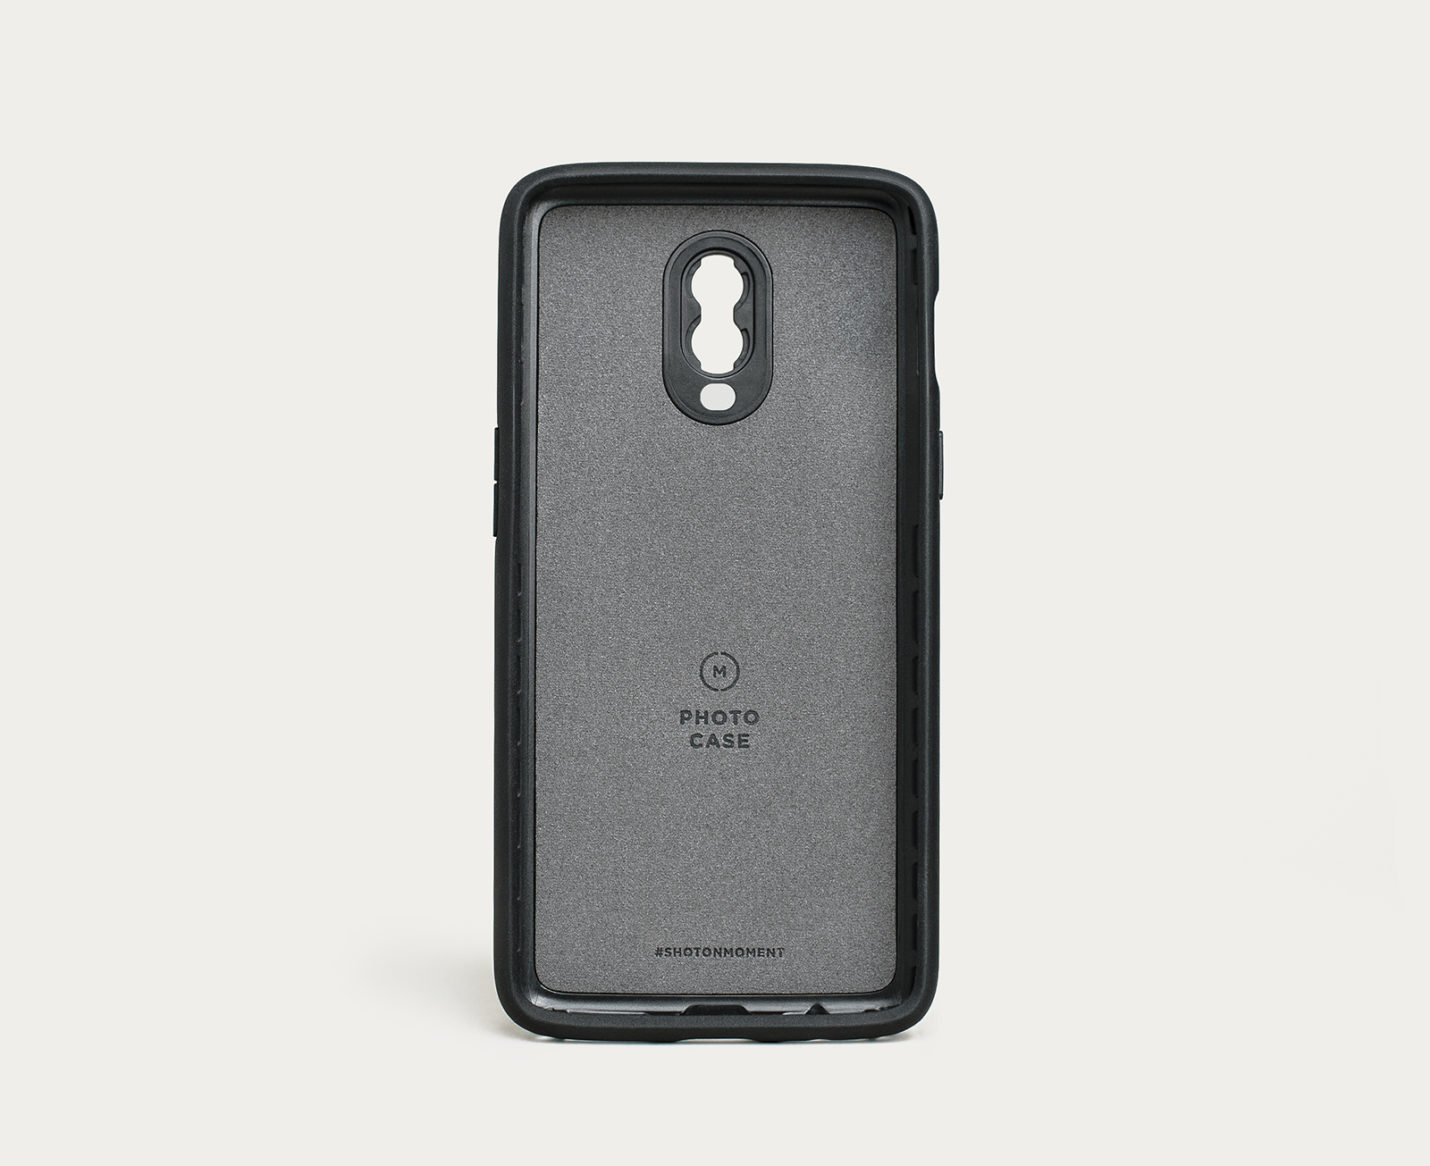 new styles 6221a fff8c OnePlus Photo Case | OnePlus 6T - Black Canvas